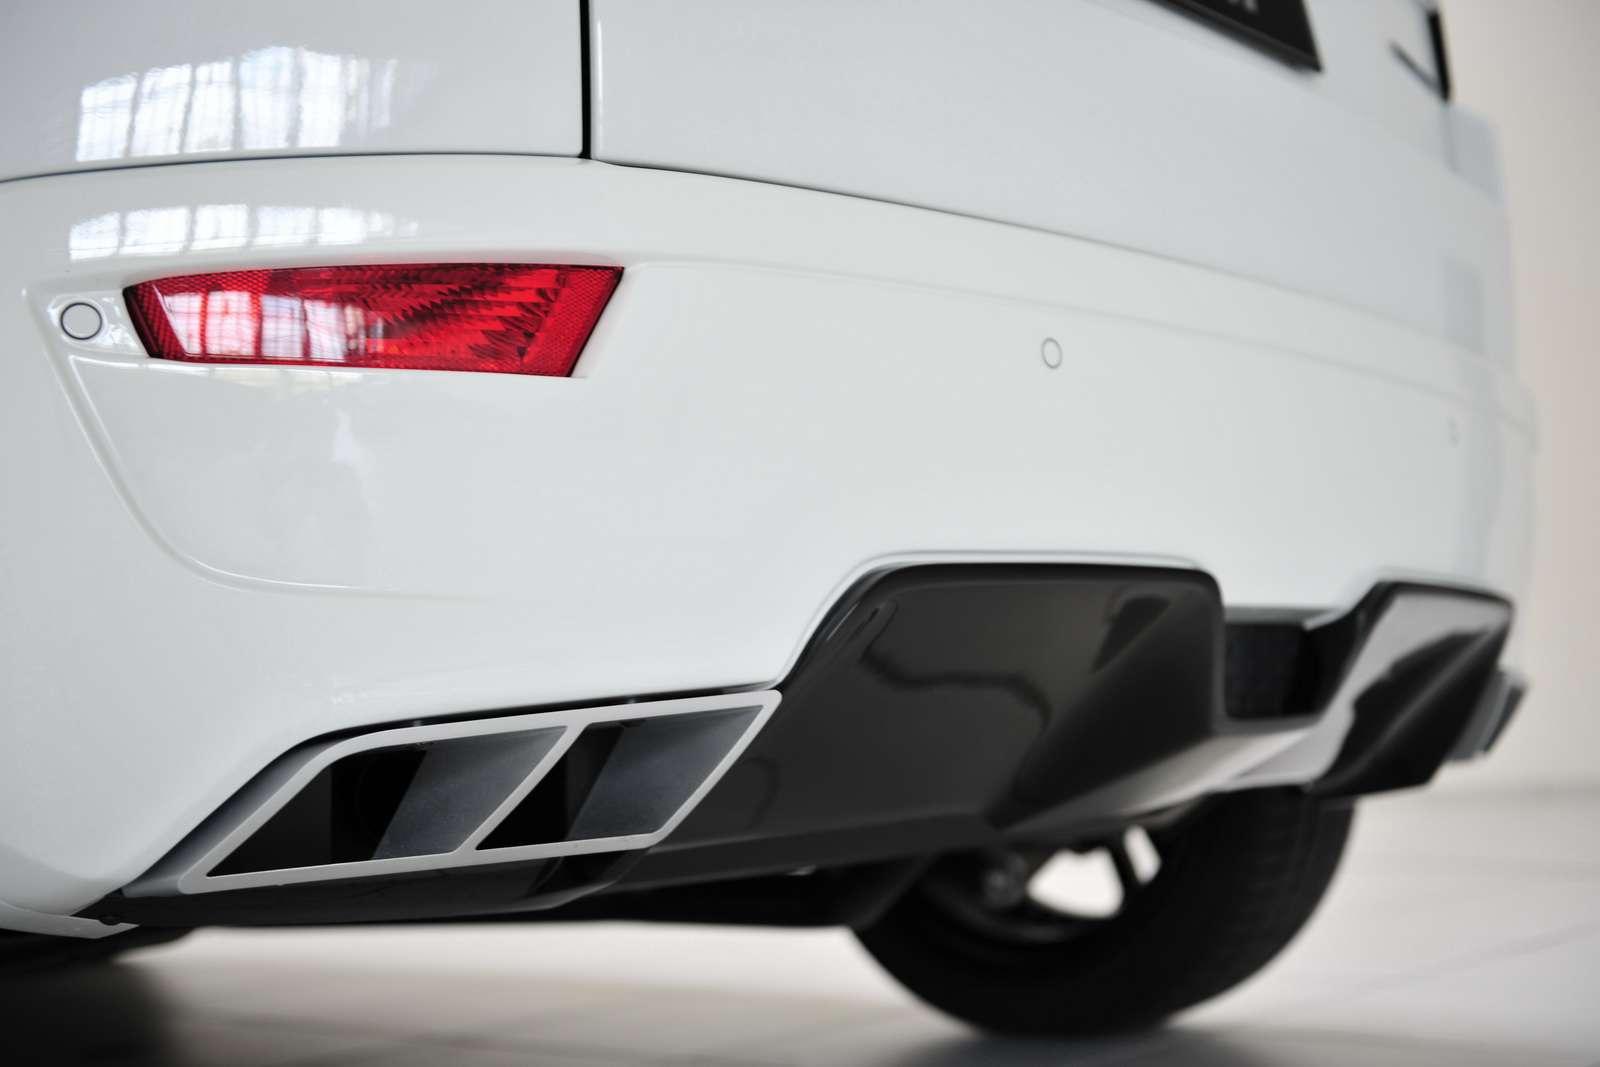 Range Rover Evoque startech fot listopad 2011